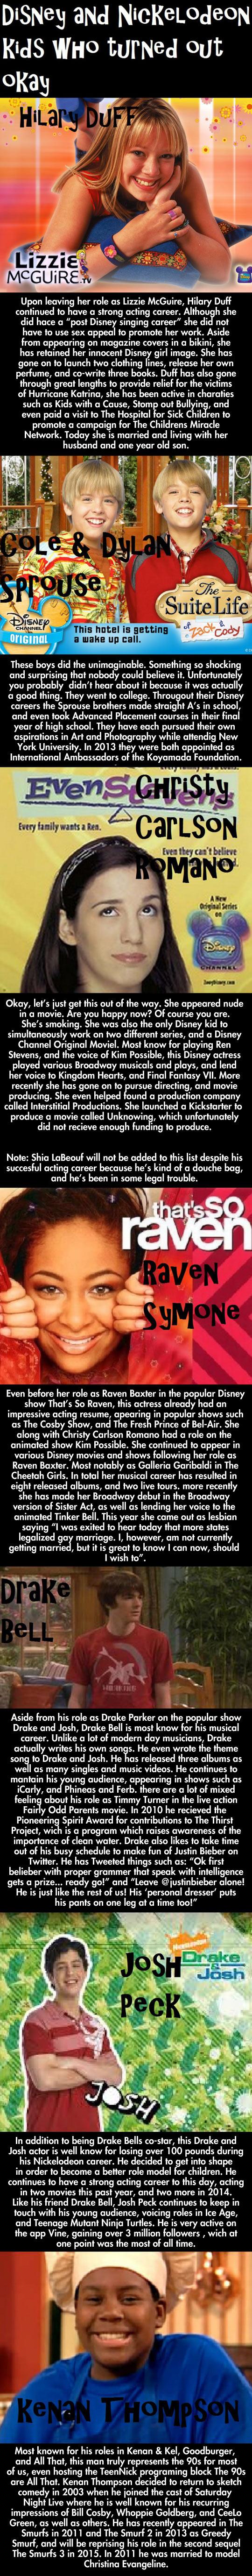 funny-Disney-Nickelodeon-Hilary-Duff-Kenan